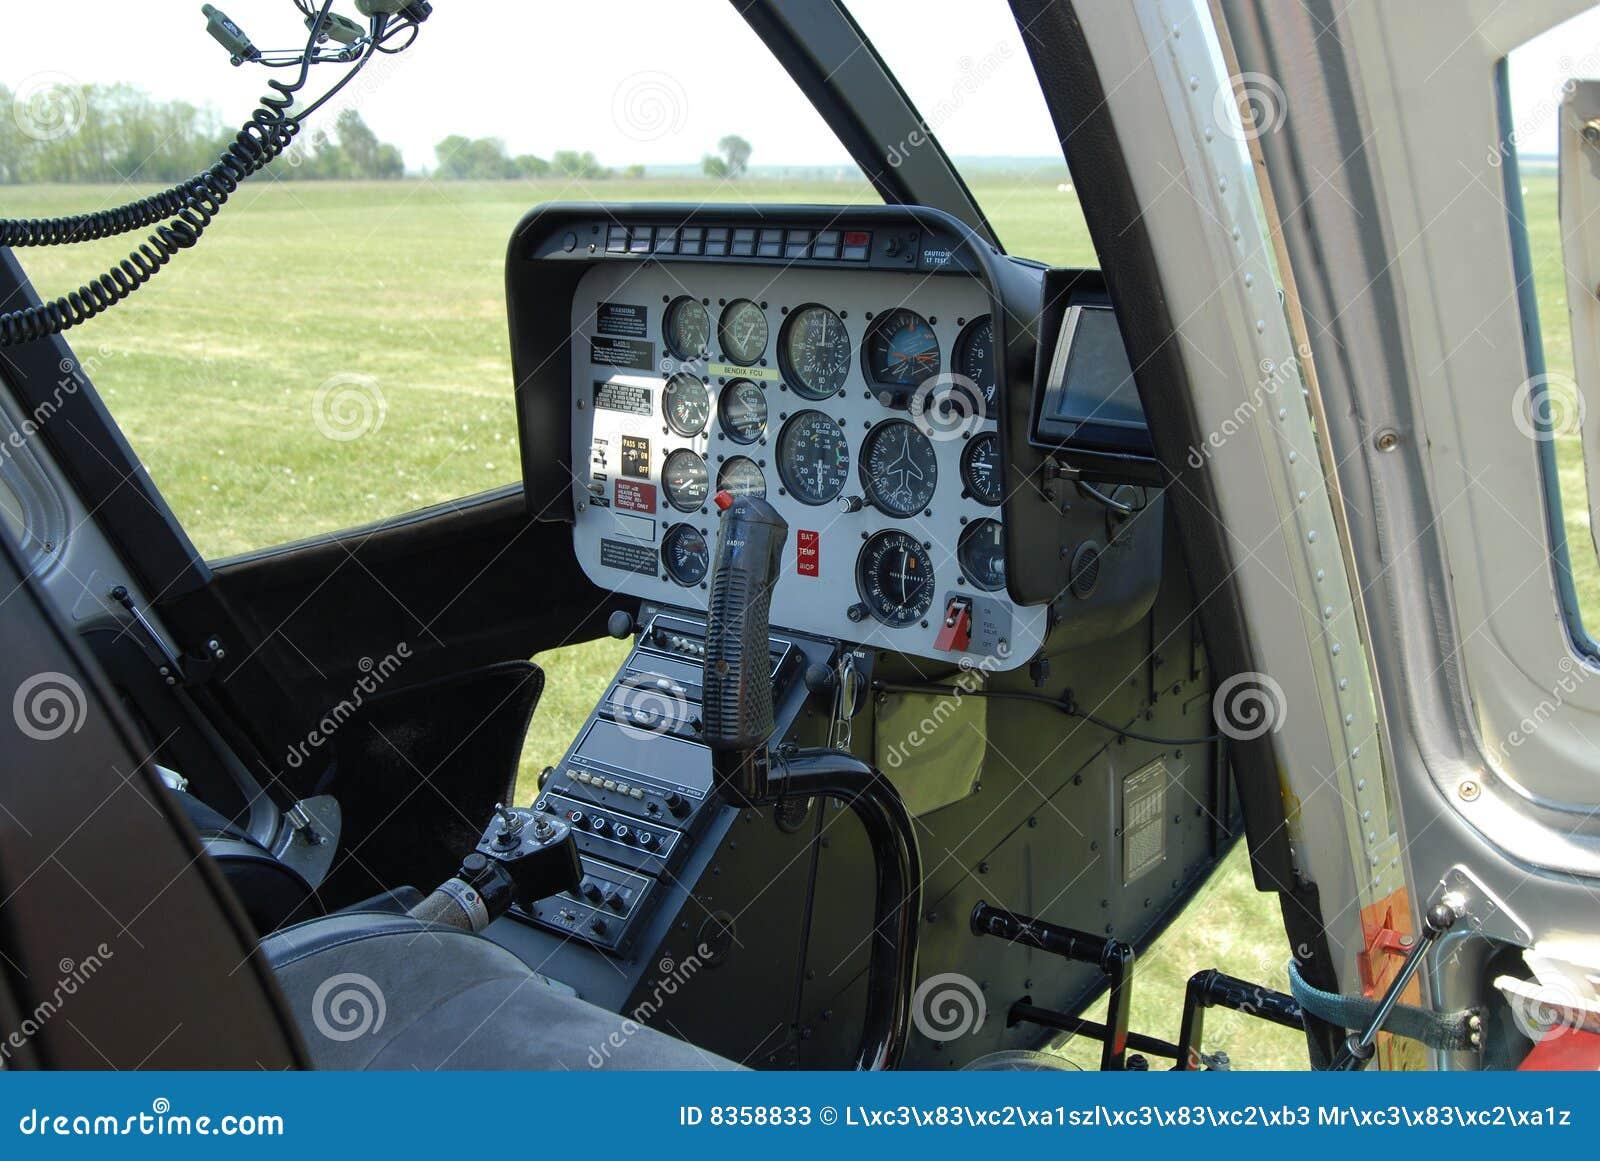 pilot helicopter with E5 Ba 93 E5 Ad 98 E7 85 A7 E7 89 87  E9 A9 Be E9 A9 B6 E8 88 B1  E5 8d 87 E6 9c Ba E5 86 85 E9 83 A8 Image8358833 on Light Utility Helicopter Kit AK1 3 Media Gallery likewise File SH 60B besides Eurocopterkawasaki Bk 117 likewise Initiation Au Pilotage Dhelicoptere R22 as well Aerospatiale Sa 315 Lama HB XPJ  Private 70398 large.